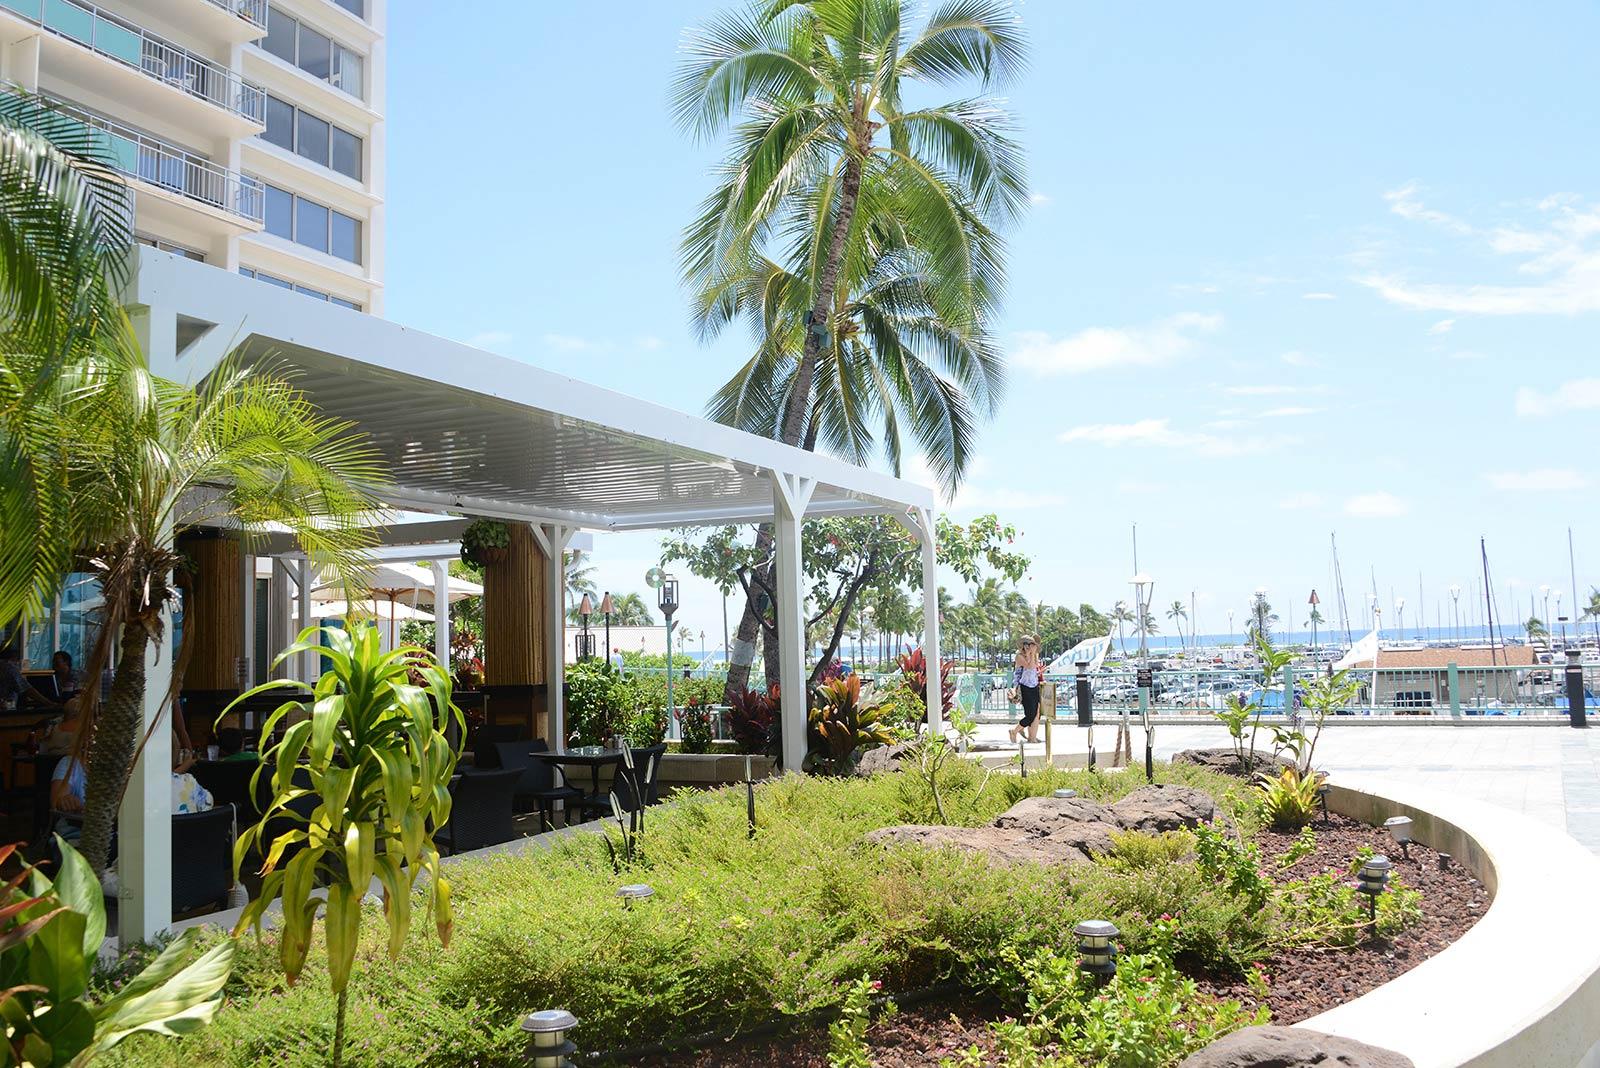 shell-vacations-hawaii-shell-owners-club-hawaii-13